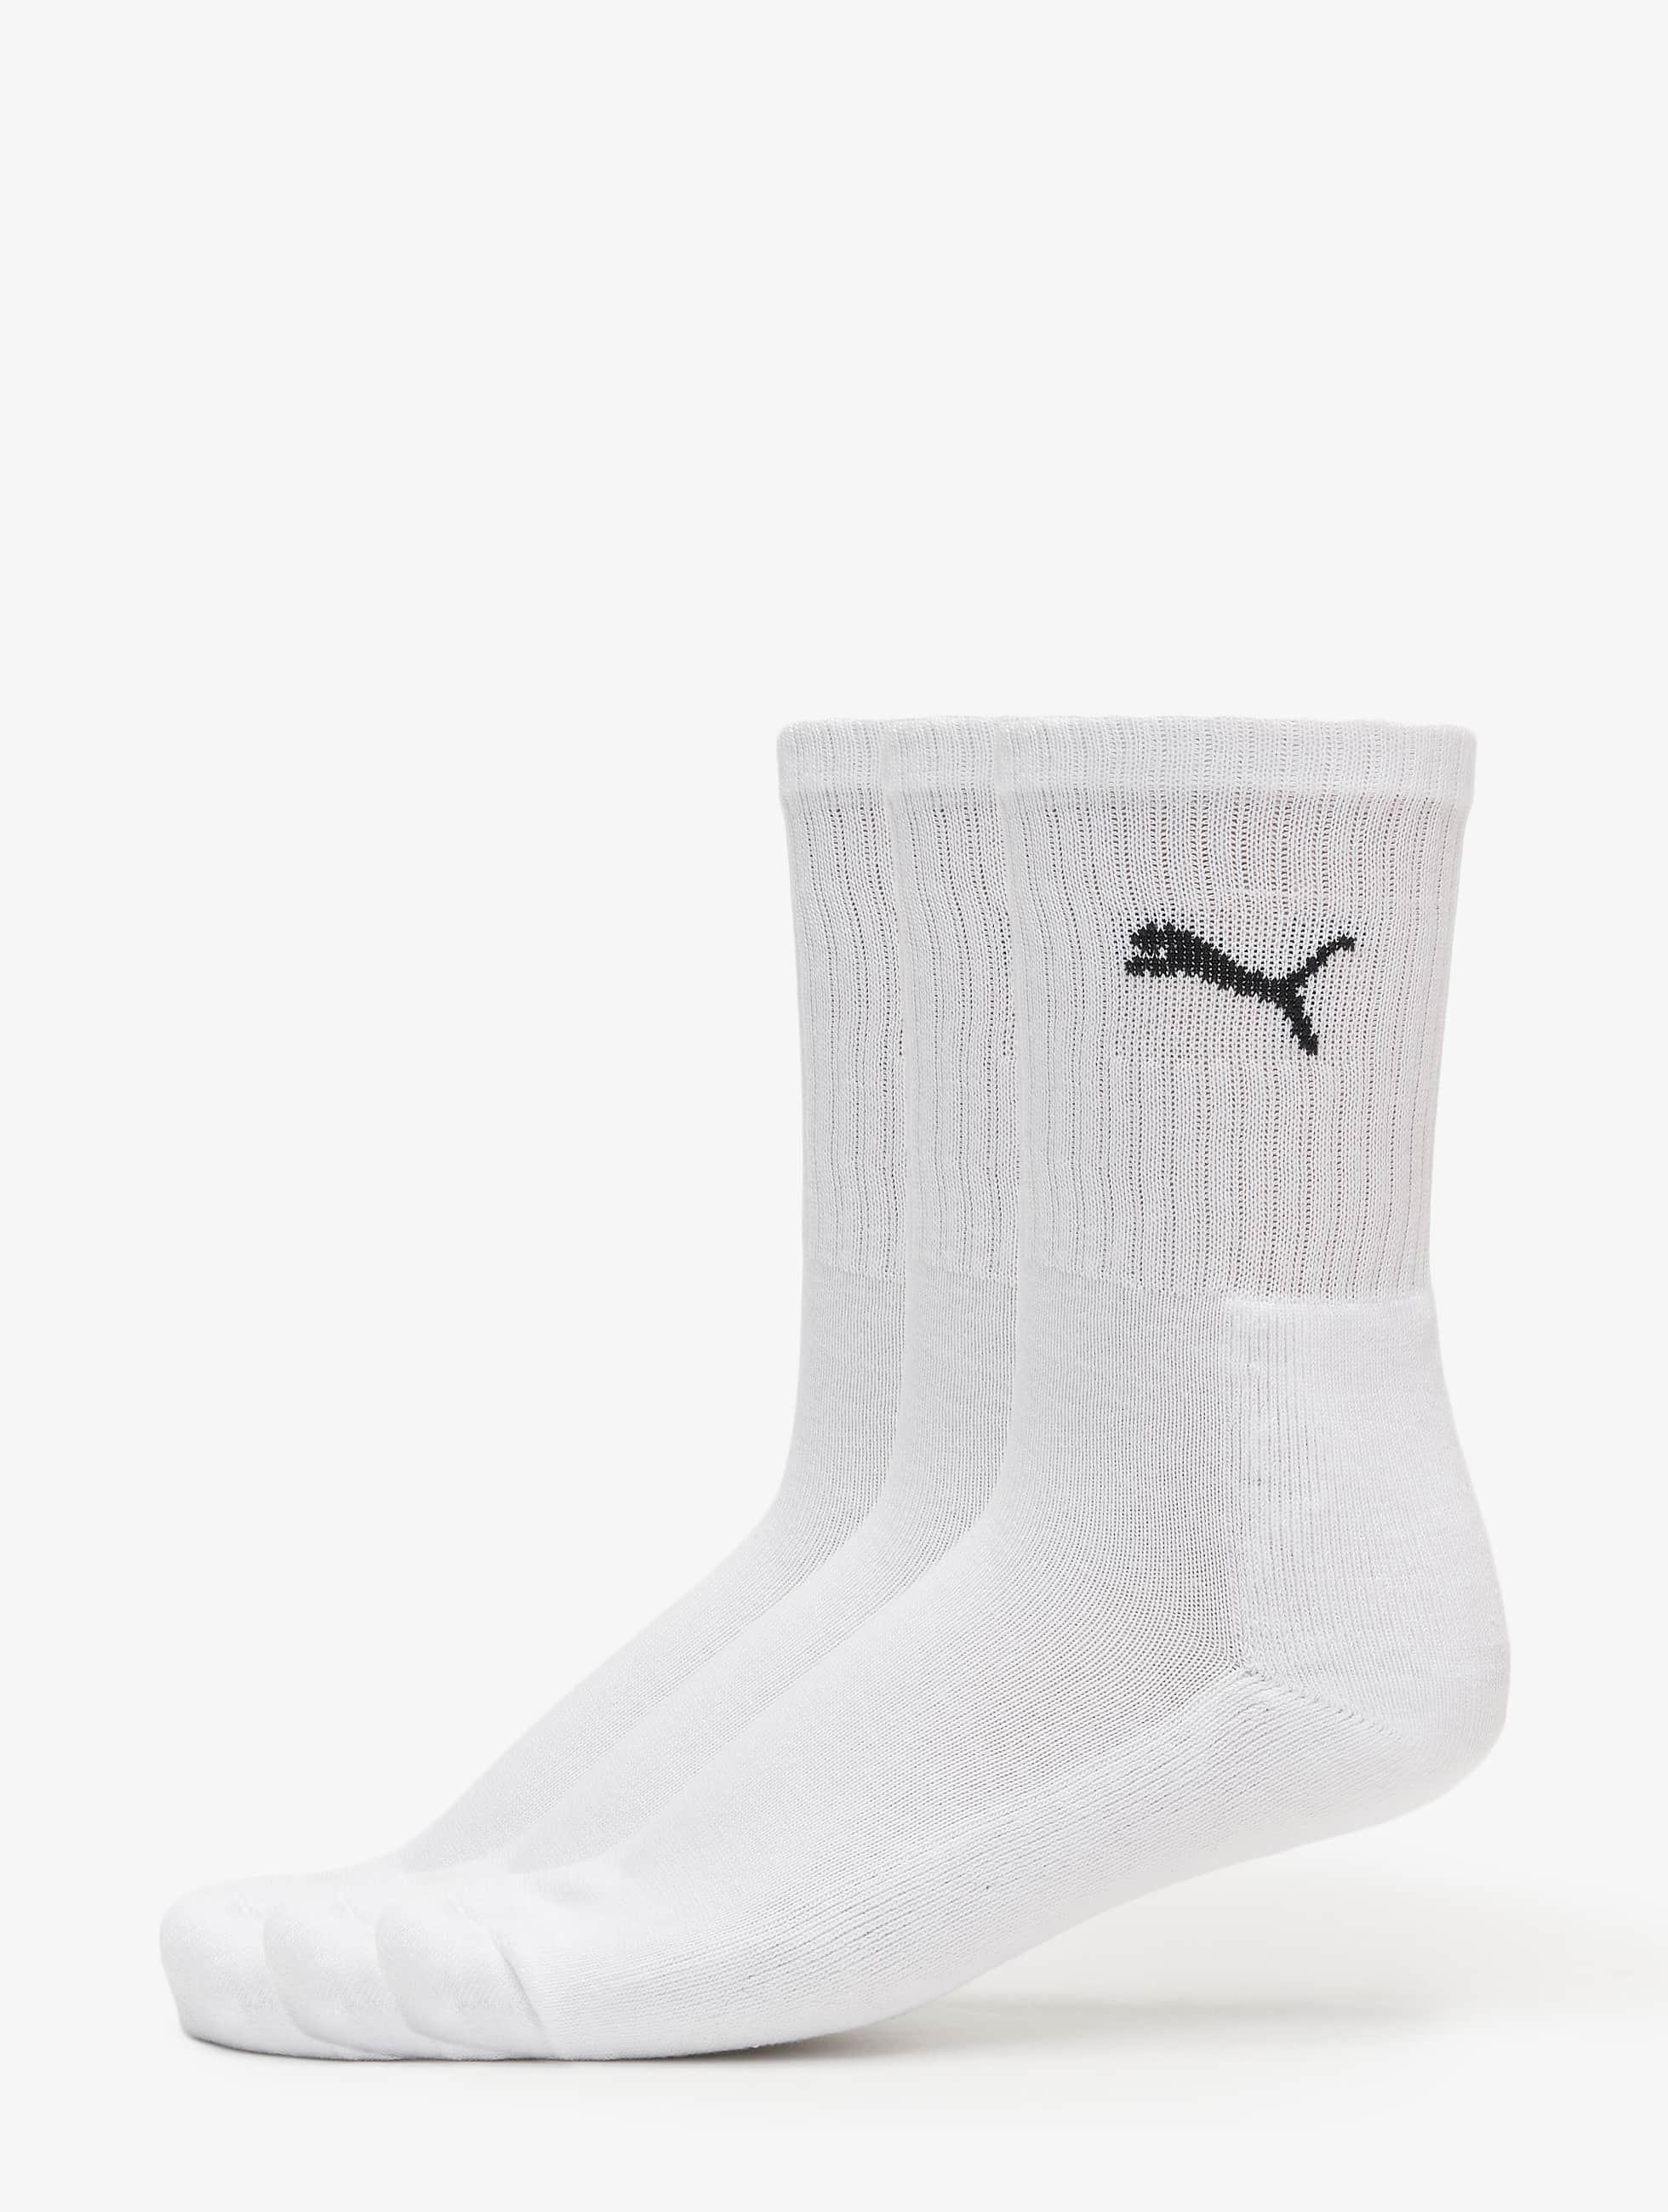 Puma Männer,Frauen Socken 3-Pack Sport in weiß